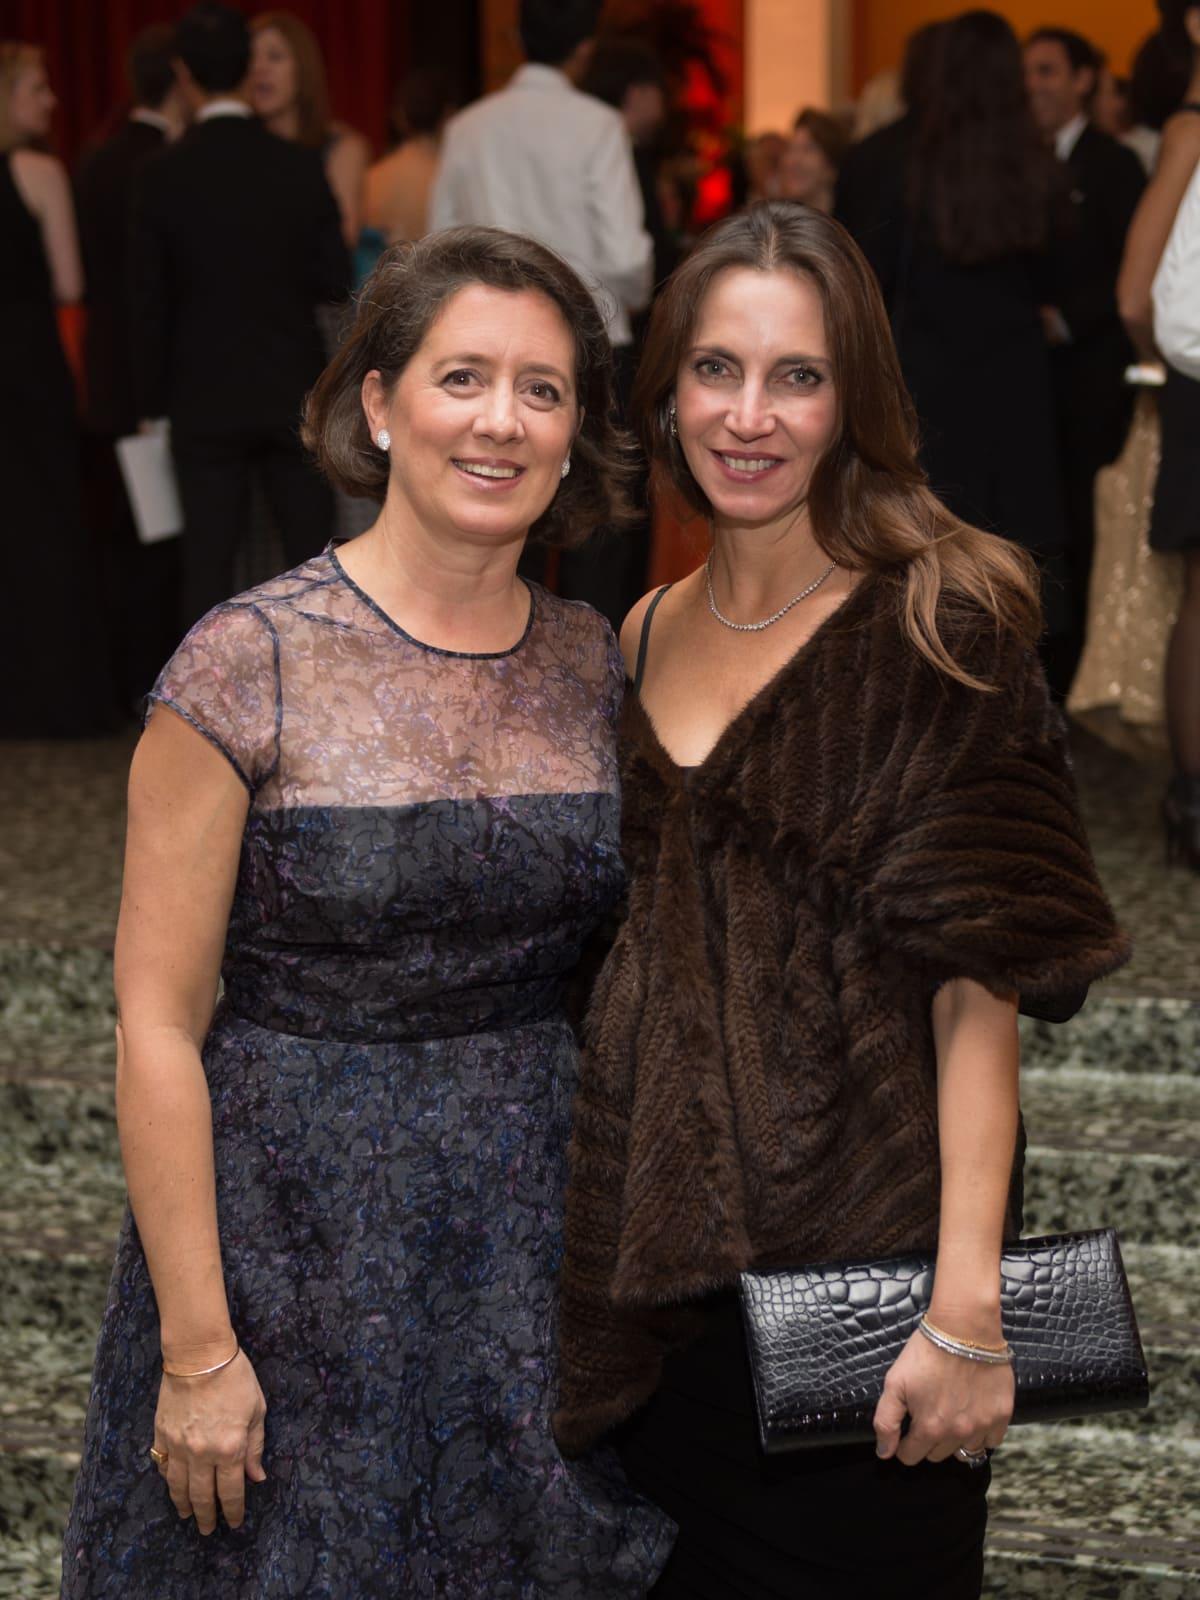 News, MFAH Latin Experience, Nov. 2015 Maria Bonta de la Pezuela, Aliyya Stude